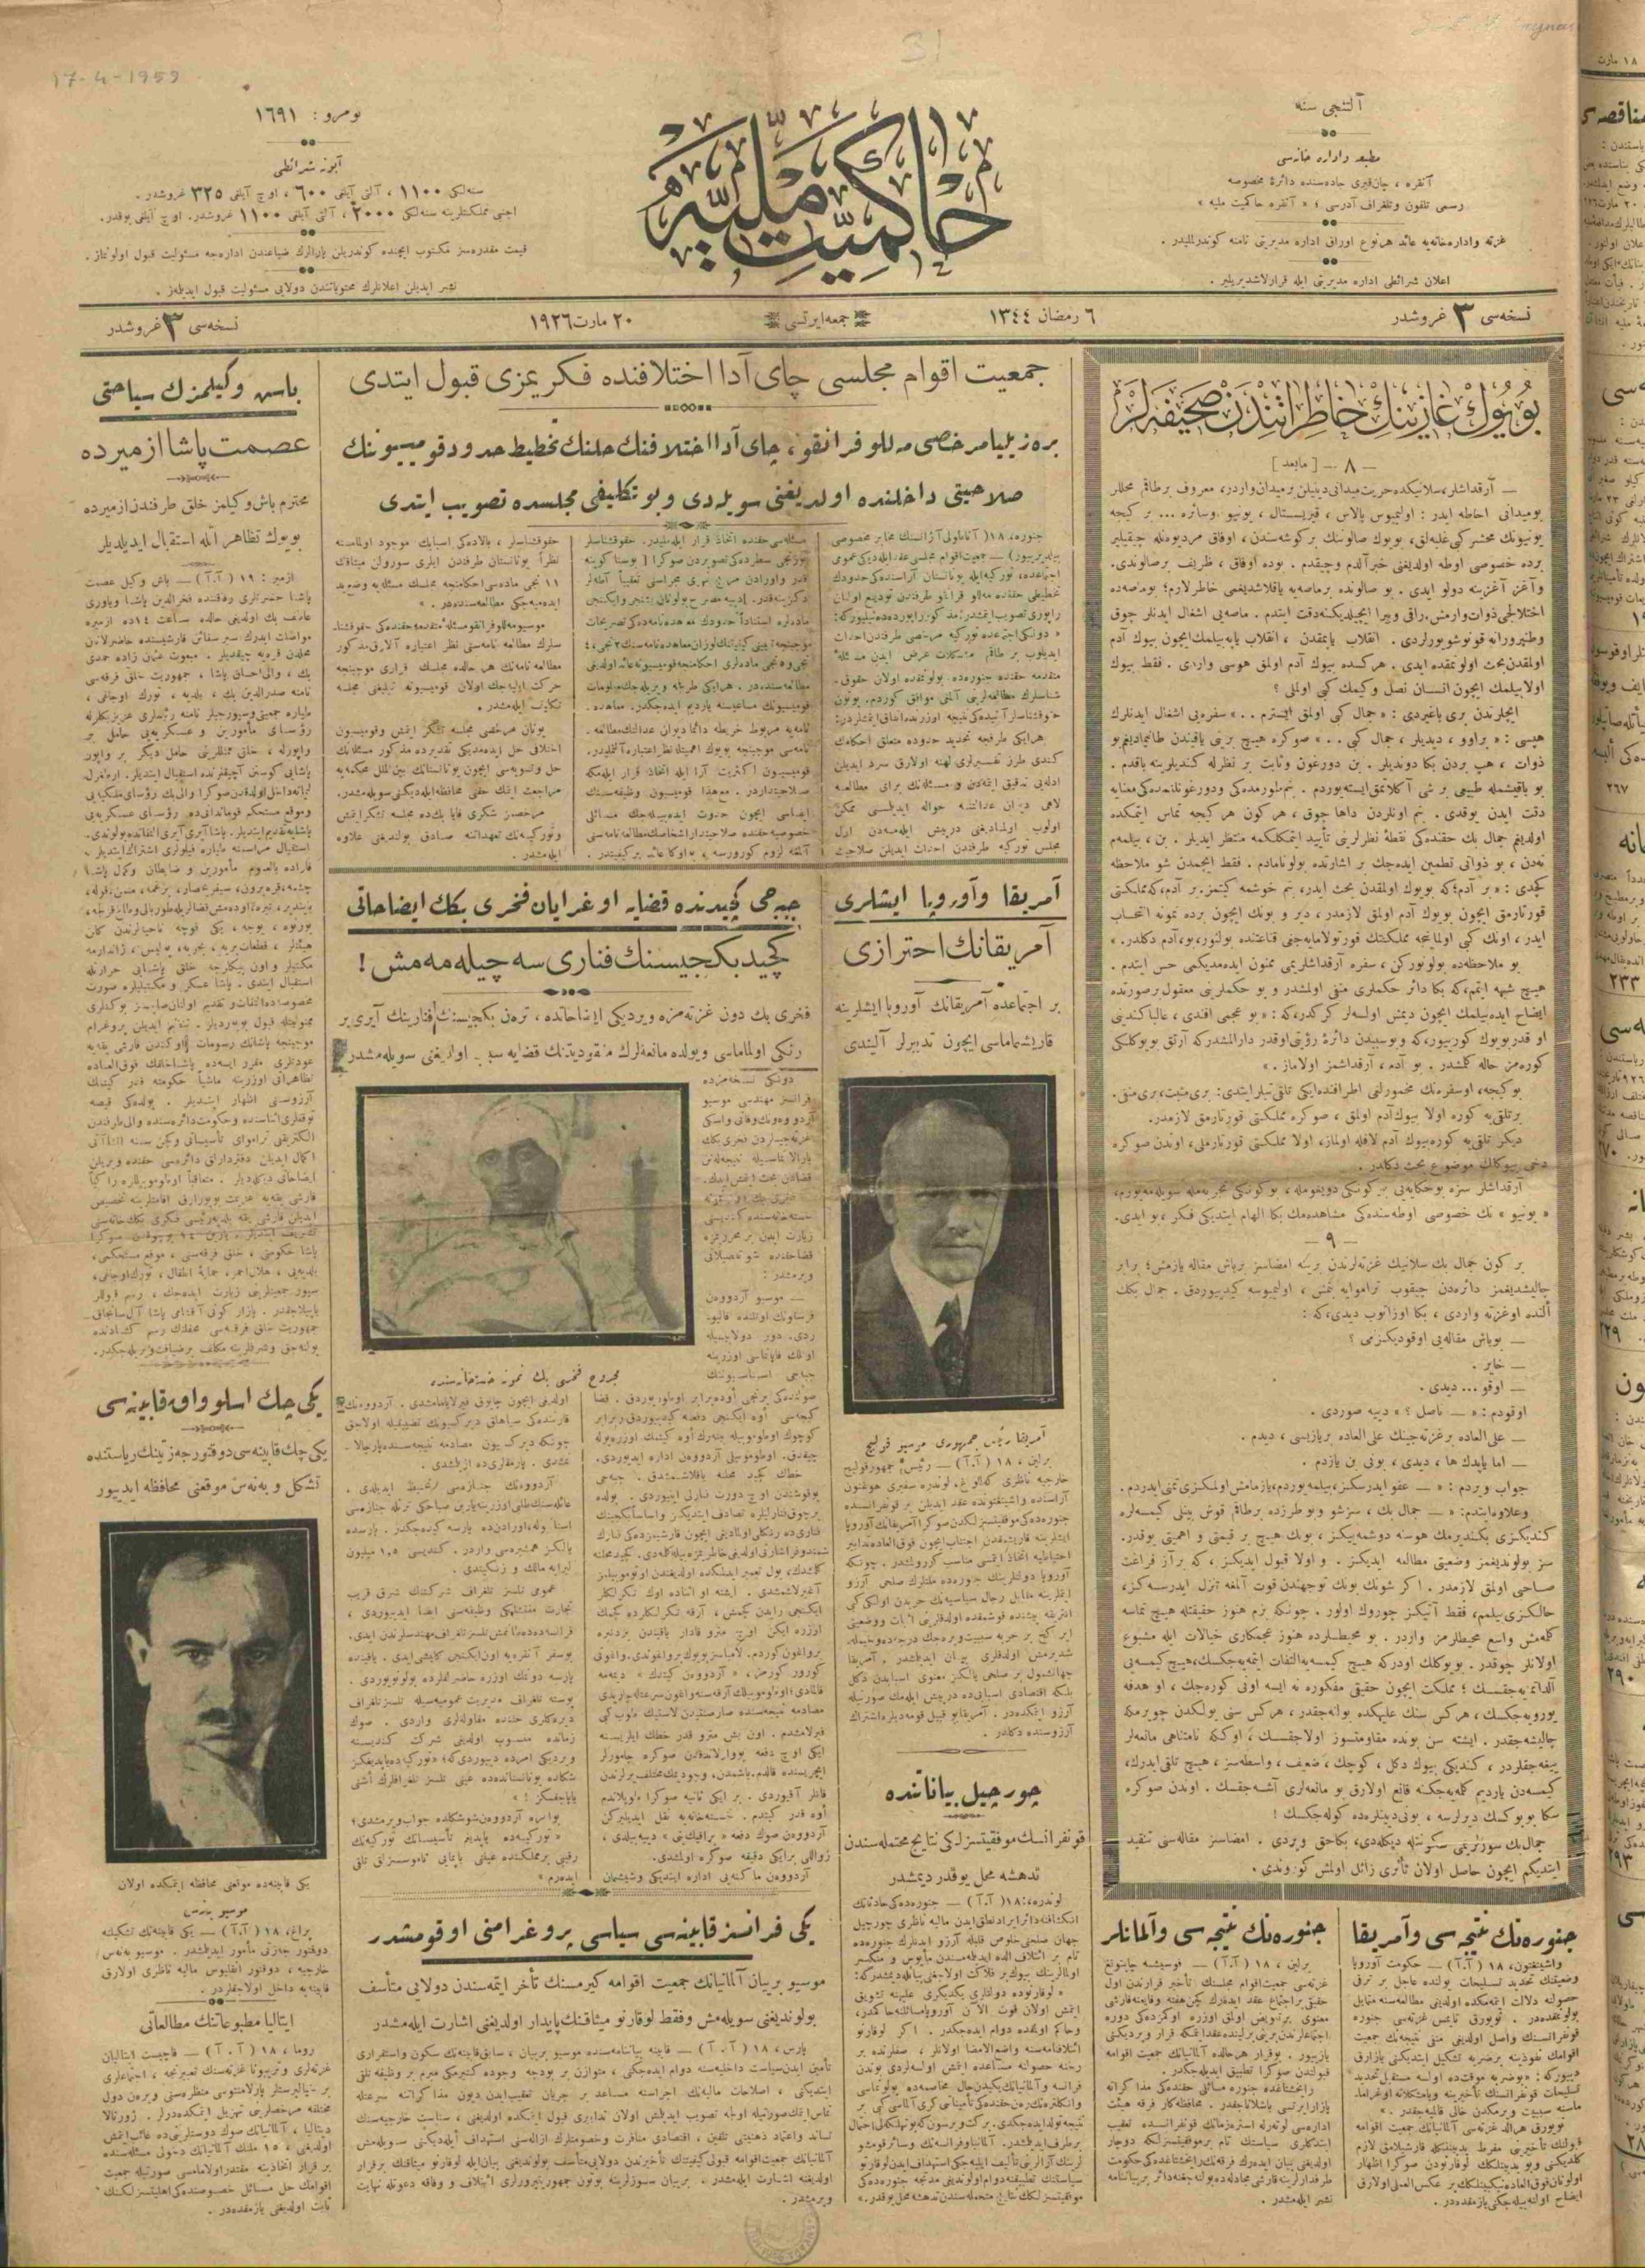 20 Mart 1926 Tarihli Hakimiyet-i Milliye Gazetesi Sayfa 1